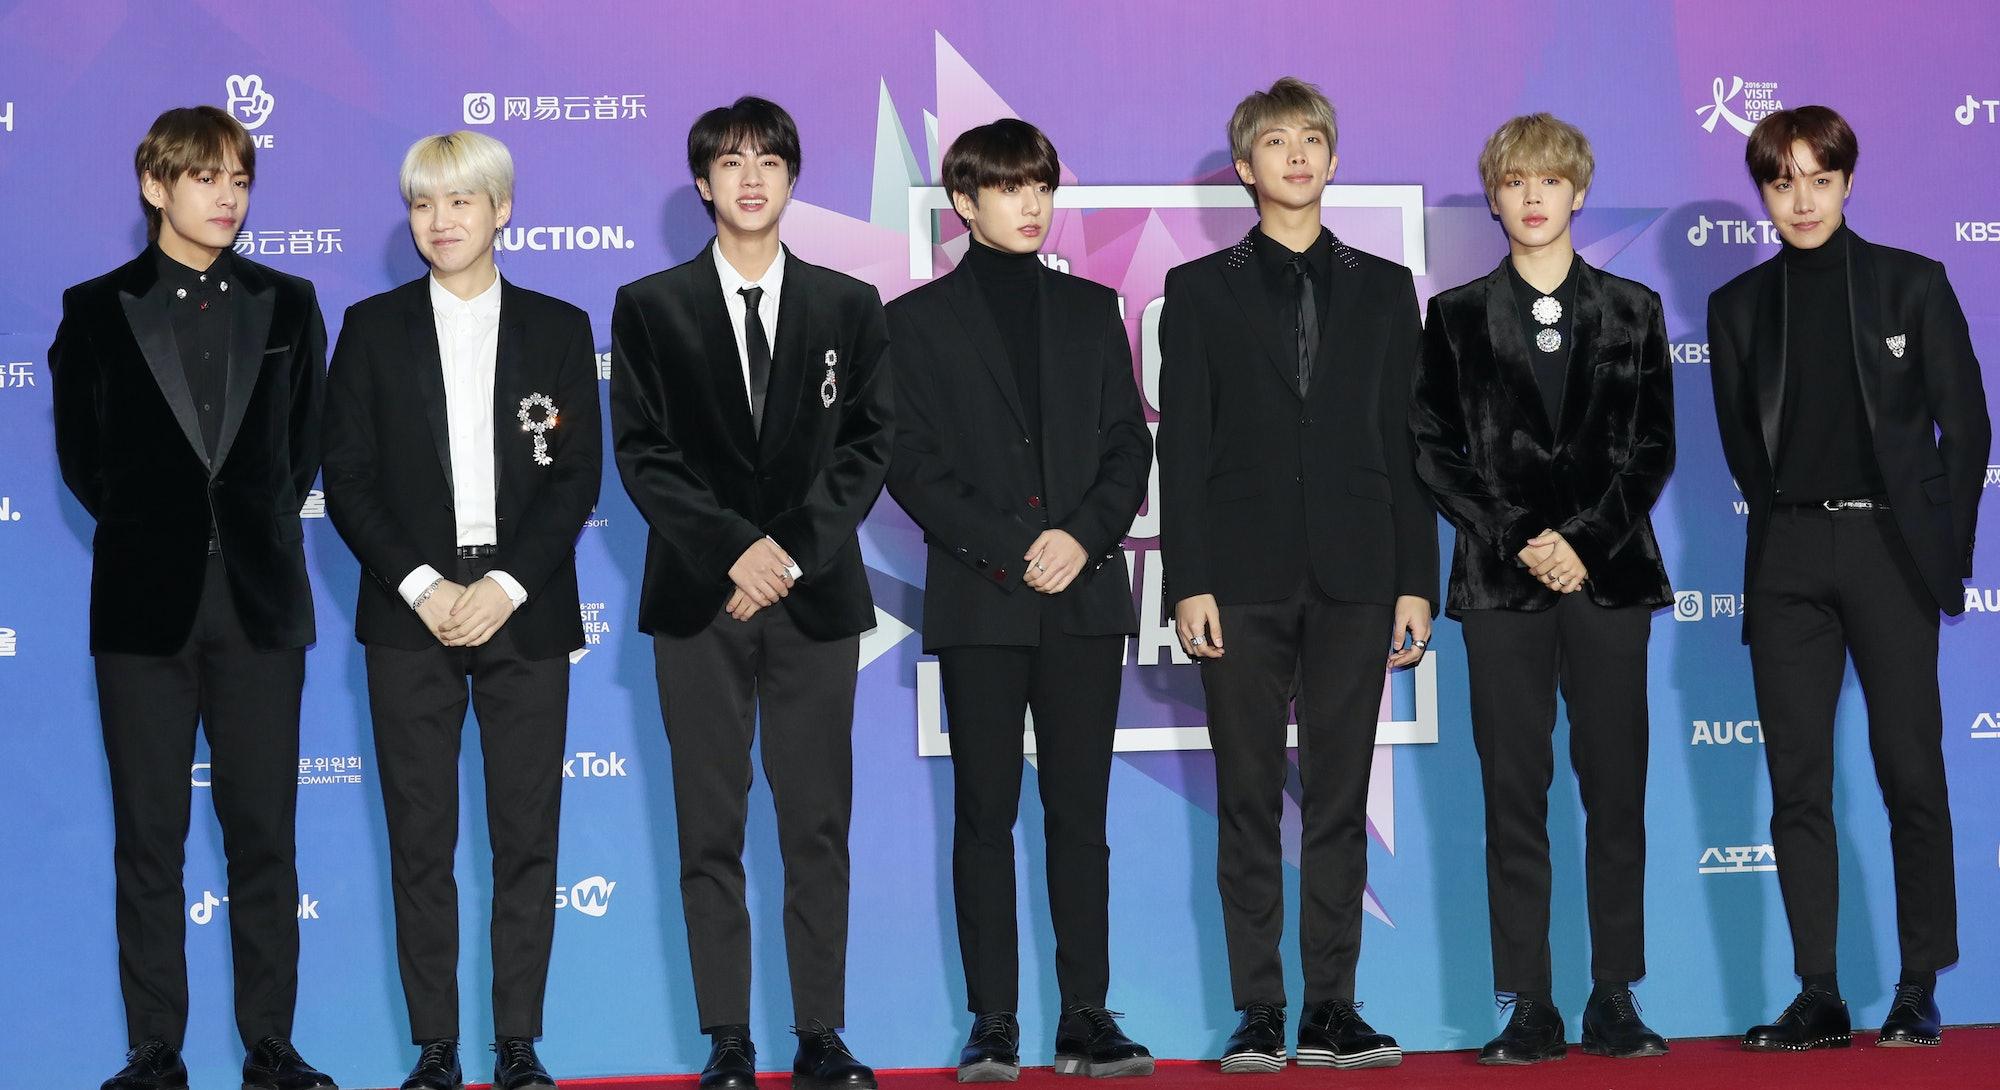 SEOUL, SOUTH KOREA - JANUARY 25: BTS arrives at the 27th Seoul Music Awards at Gocheok Sky Dome on January 25, 2018 in Seoul, South Korea. (Photo by JTBC PLUS/Imazins via Getty Images)